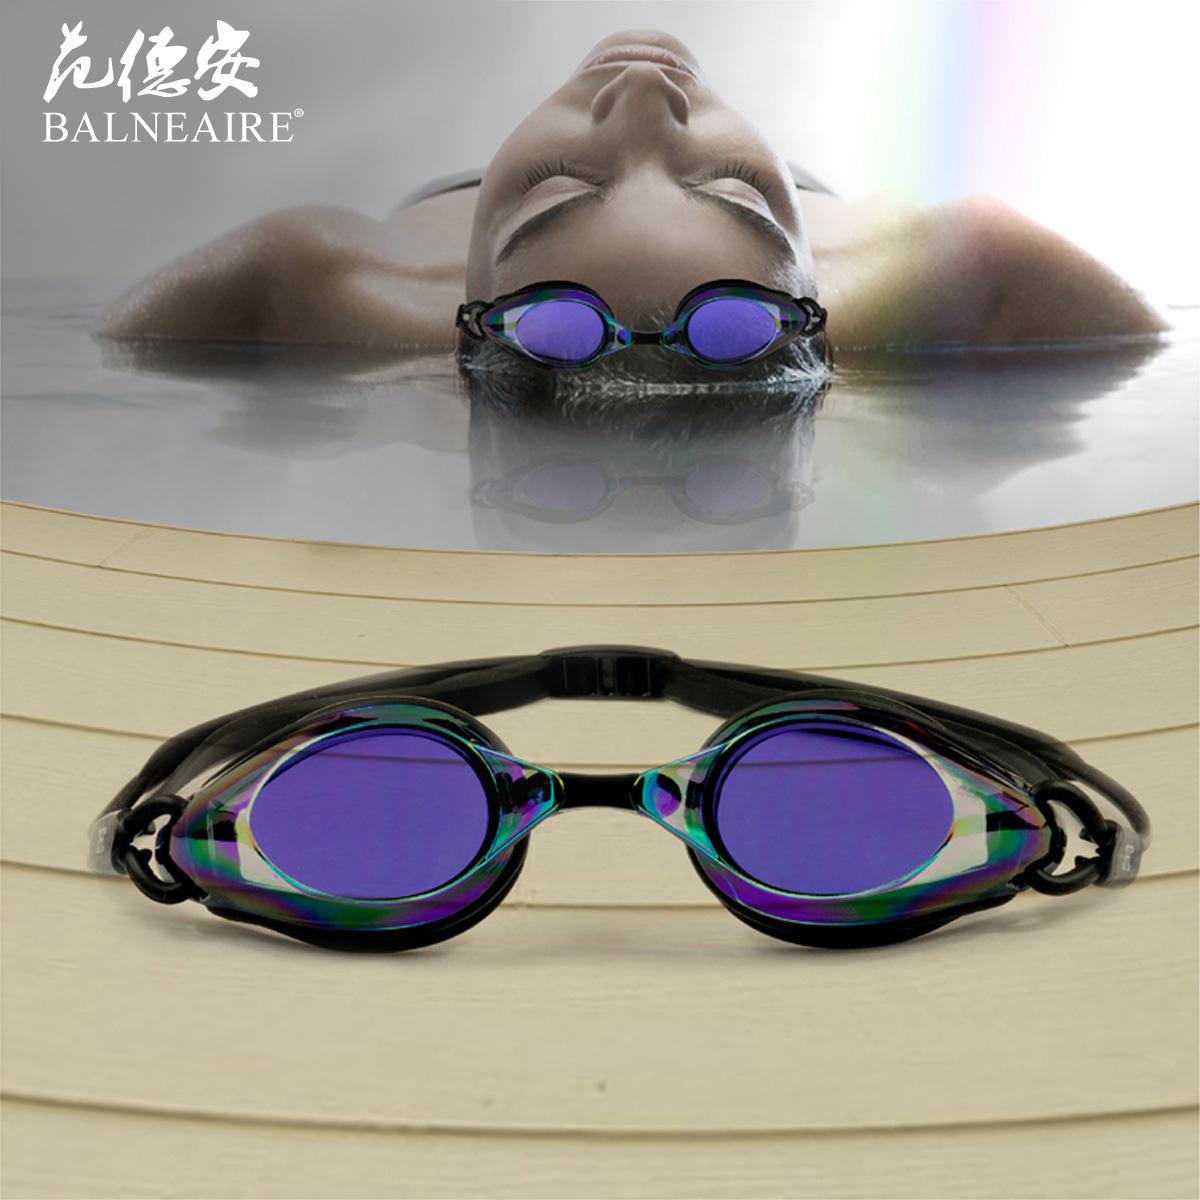 2014 Swimming Goggles Selling Freeshipping Red Acetate Glass Men Goggles Fashion Big Box Hd Waterproof Anti-fog Swimming Anti-uv(China (Mainland))